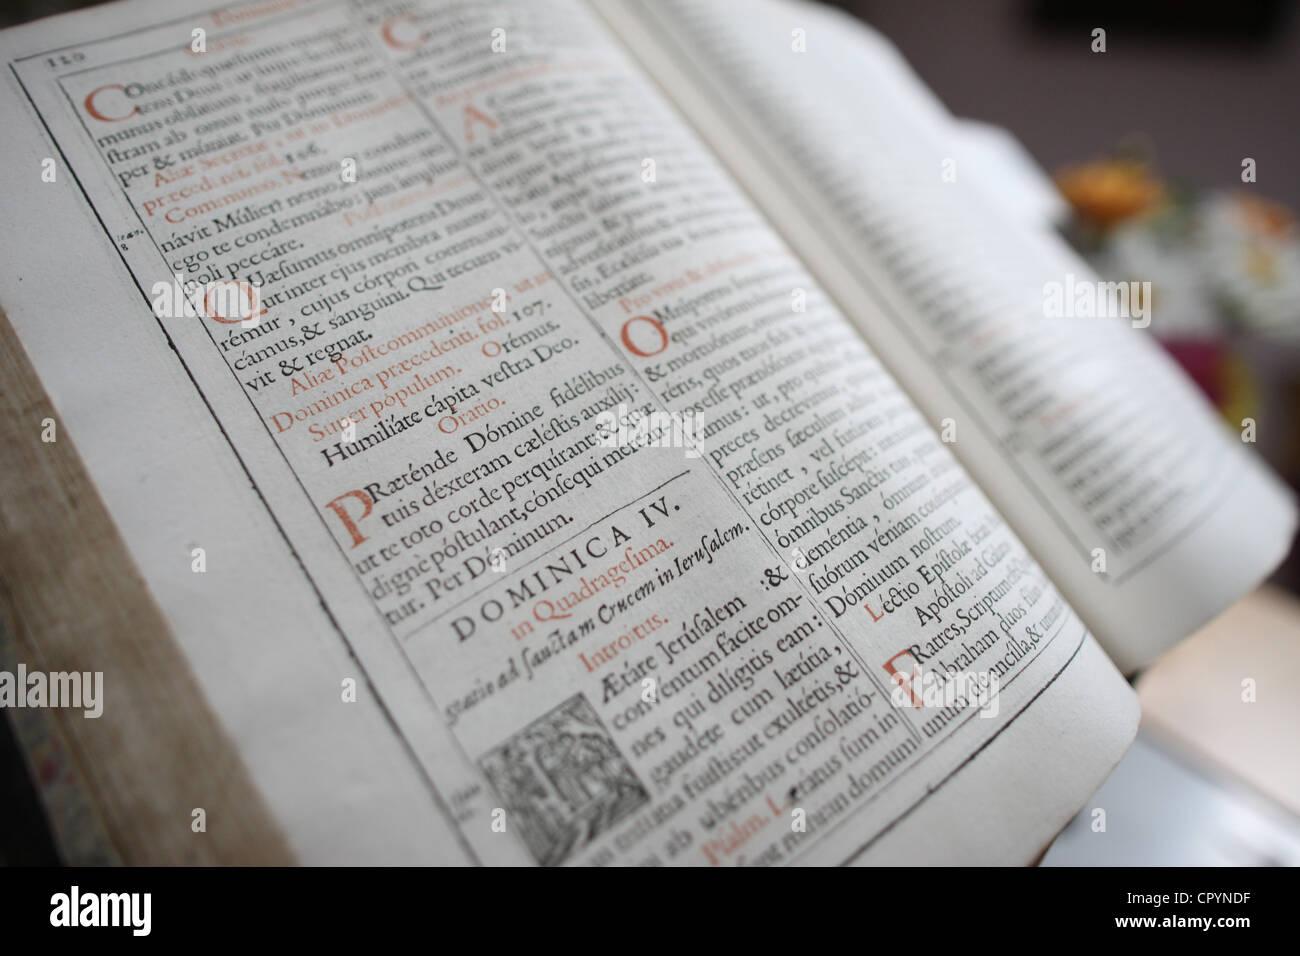 Lateinische Bibel, Frankreich, Europa Stockbild